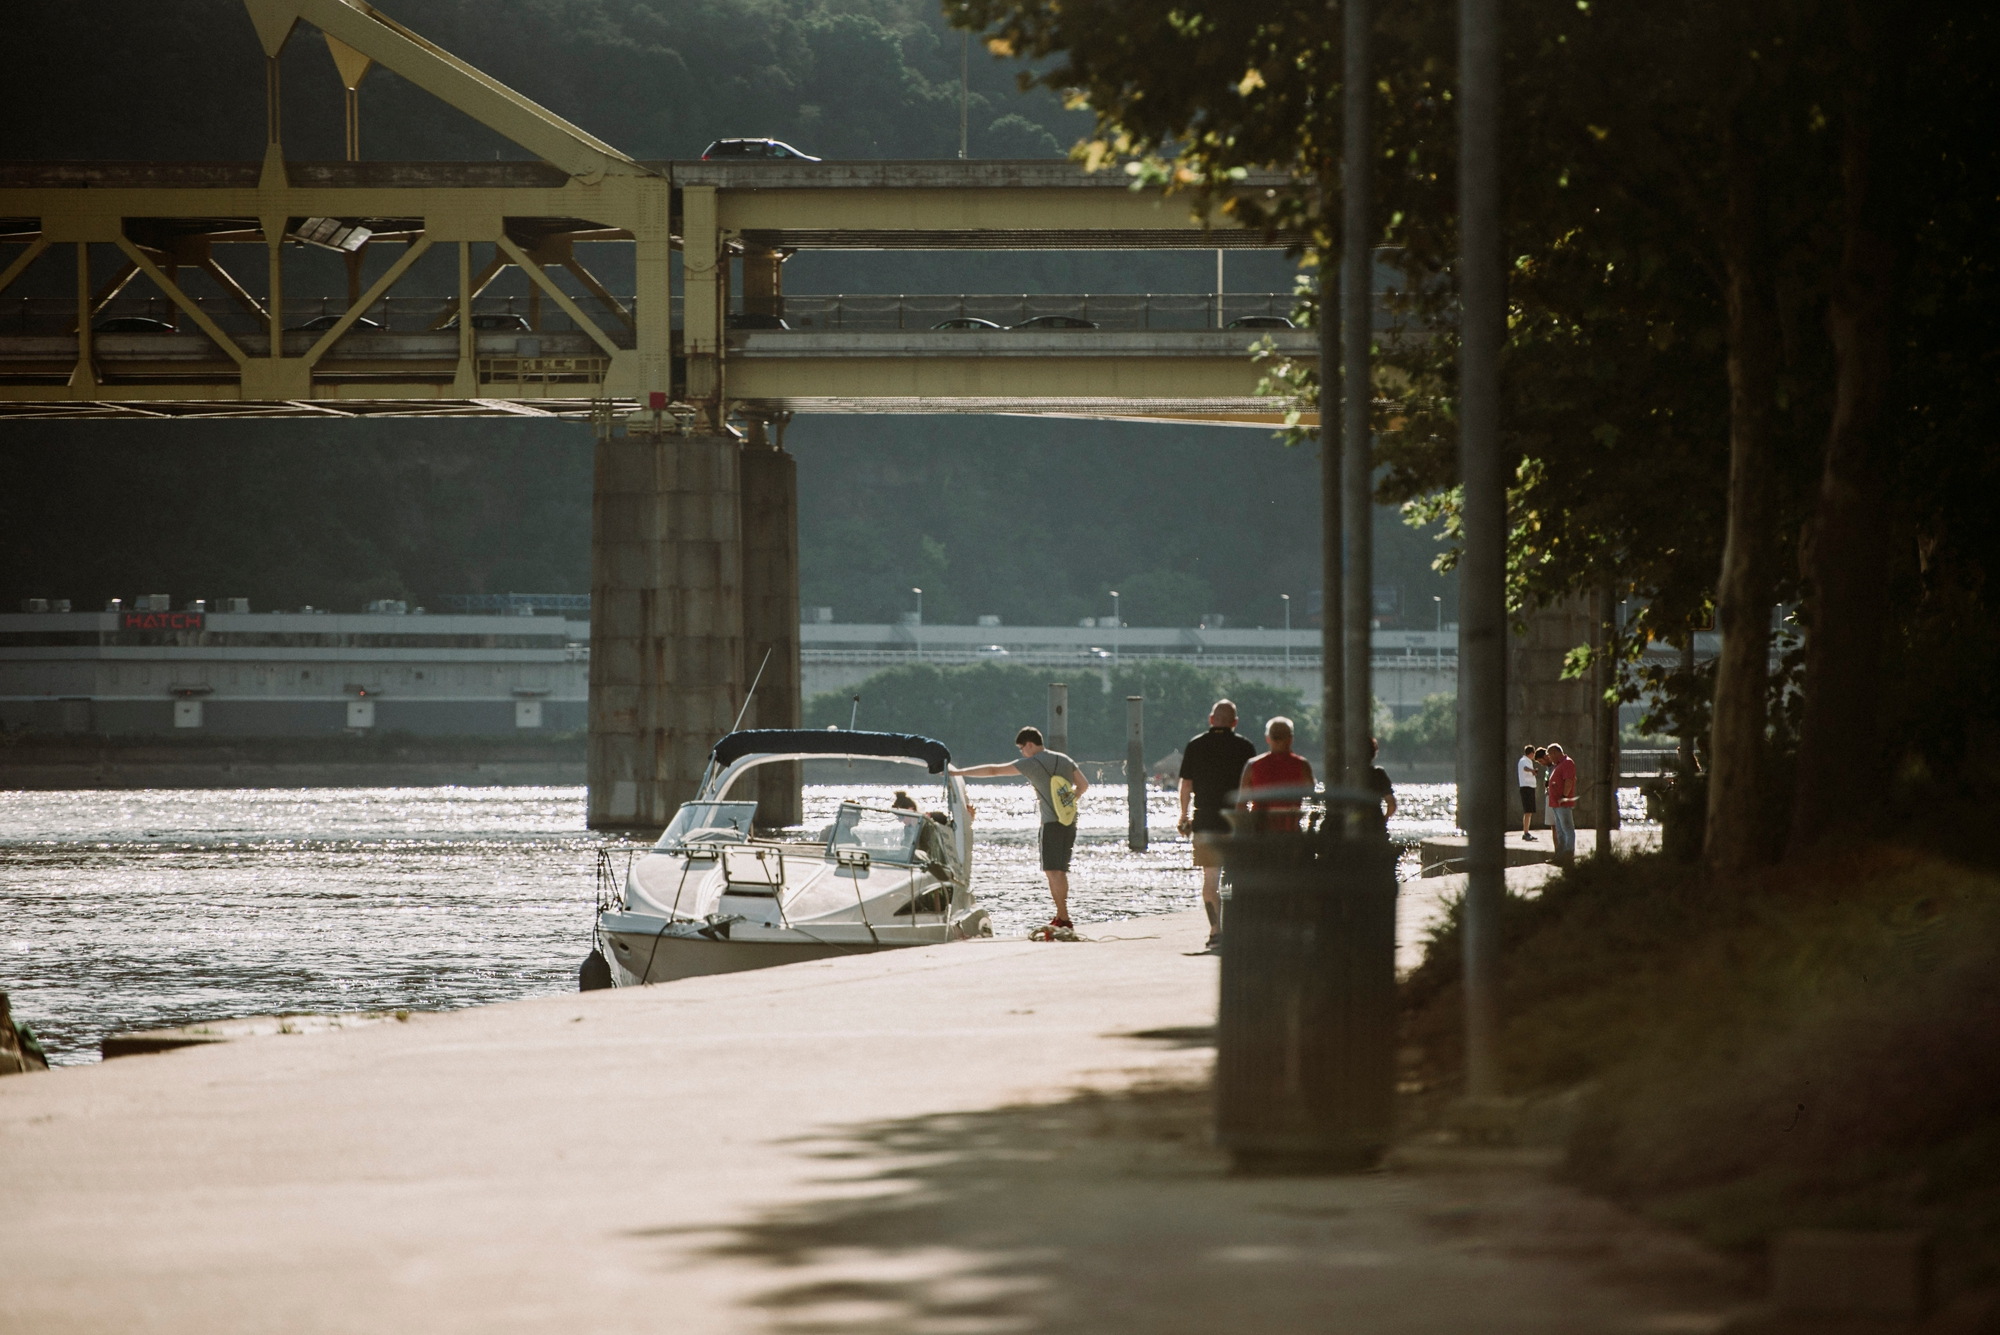 0100Jorge-Clara-Proposal-Pittsburgh_Proposal-Pittsburgh-Constructed-Adventures-Sandrachile.jpg